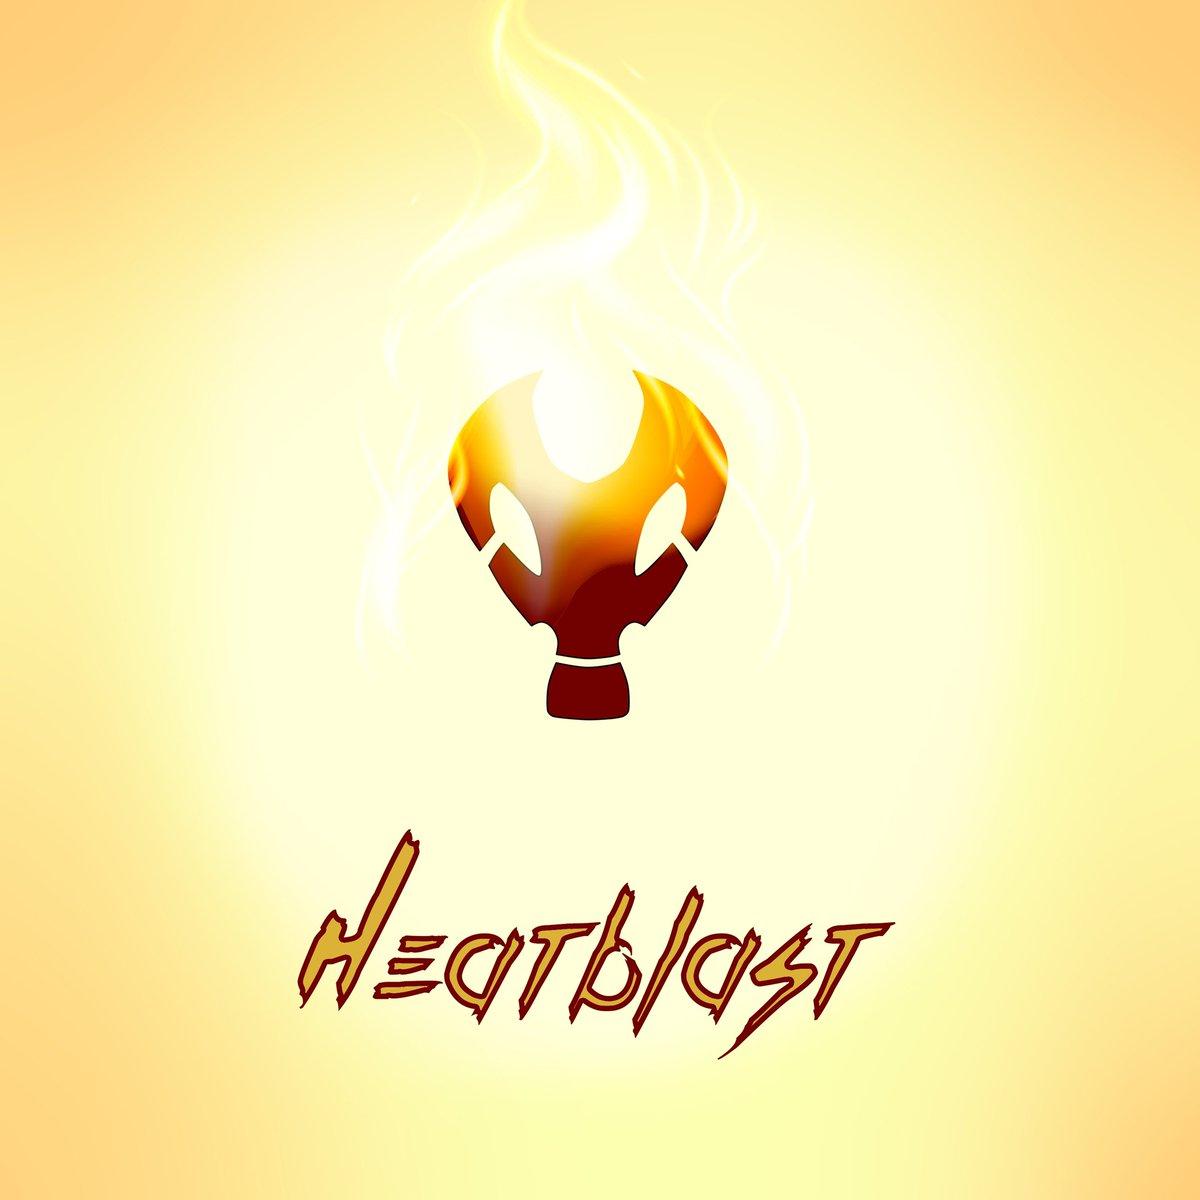 #art #illustration #picture #cover #order #feeelance #comics #ben10 #ben10alienforce #ben10ultimatealien #ben10alienswarm #ben10omniverse #fanart #poster #heatblast #fire #sticker #cartoon @ManOfActionEnt #wallpaper https://t.co/z94nEtkGEe